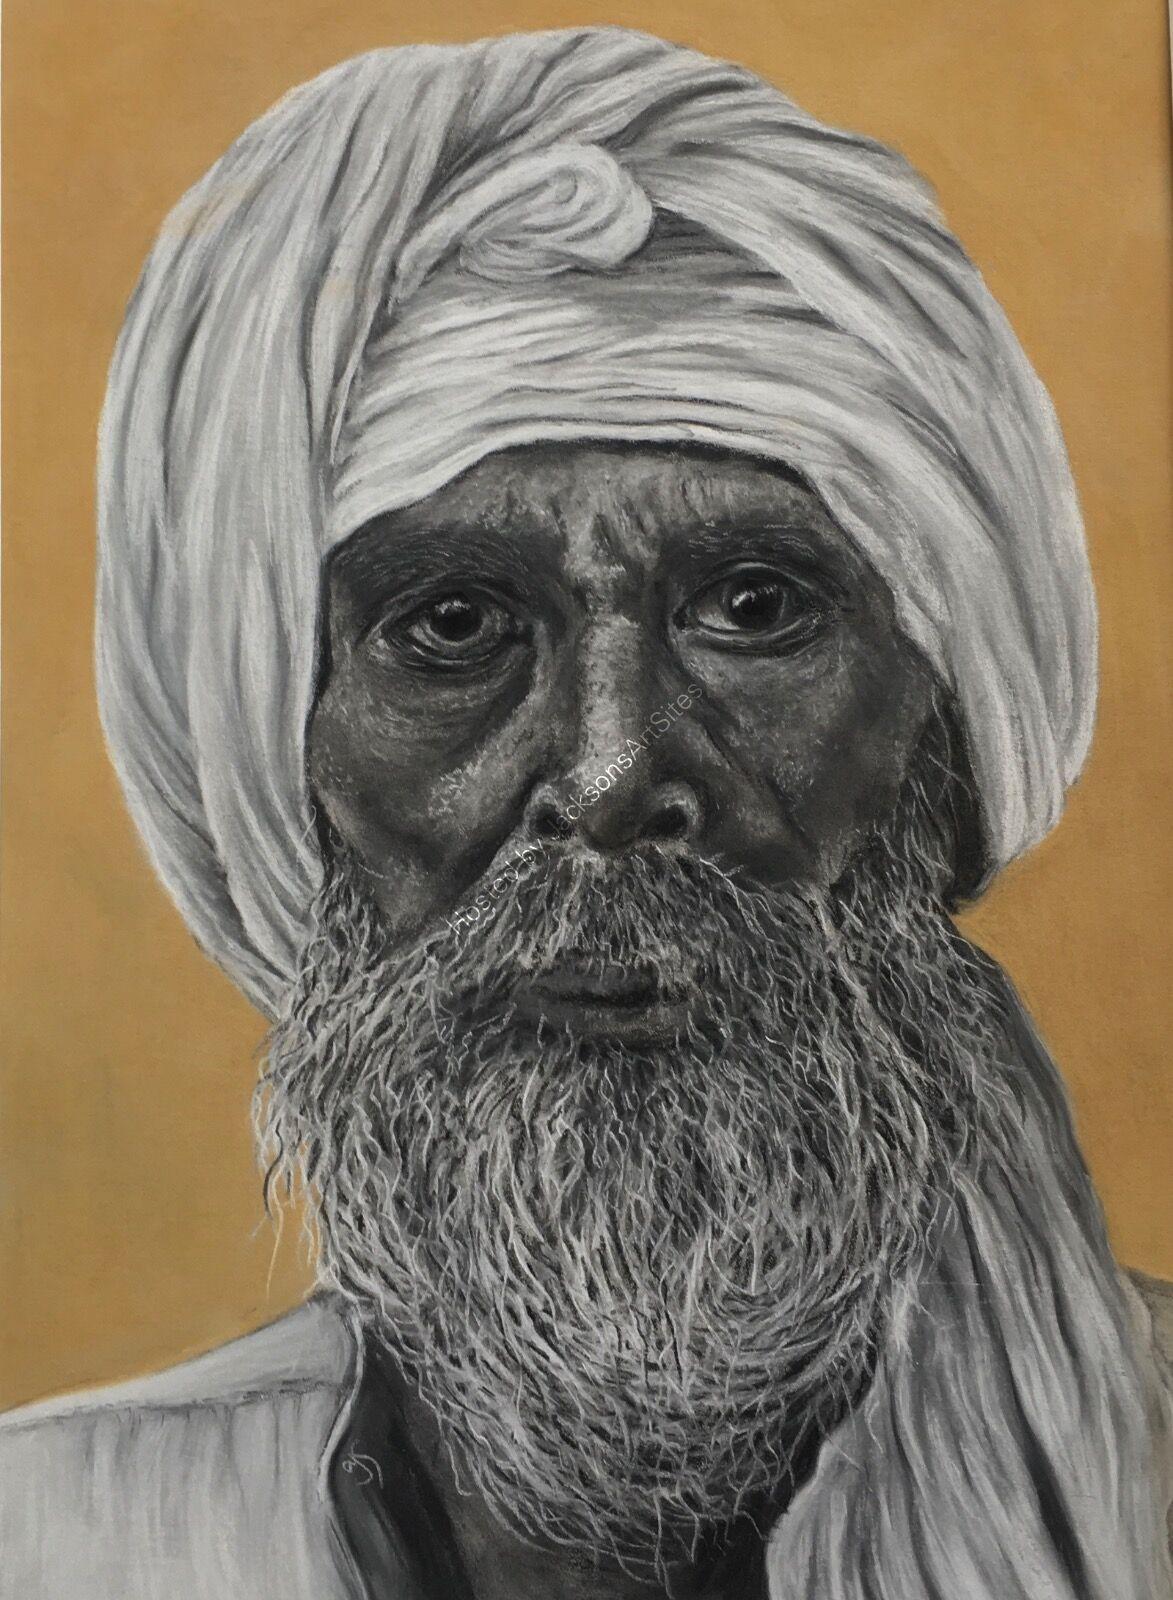 Man wearing turban